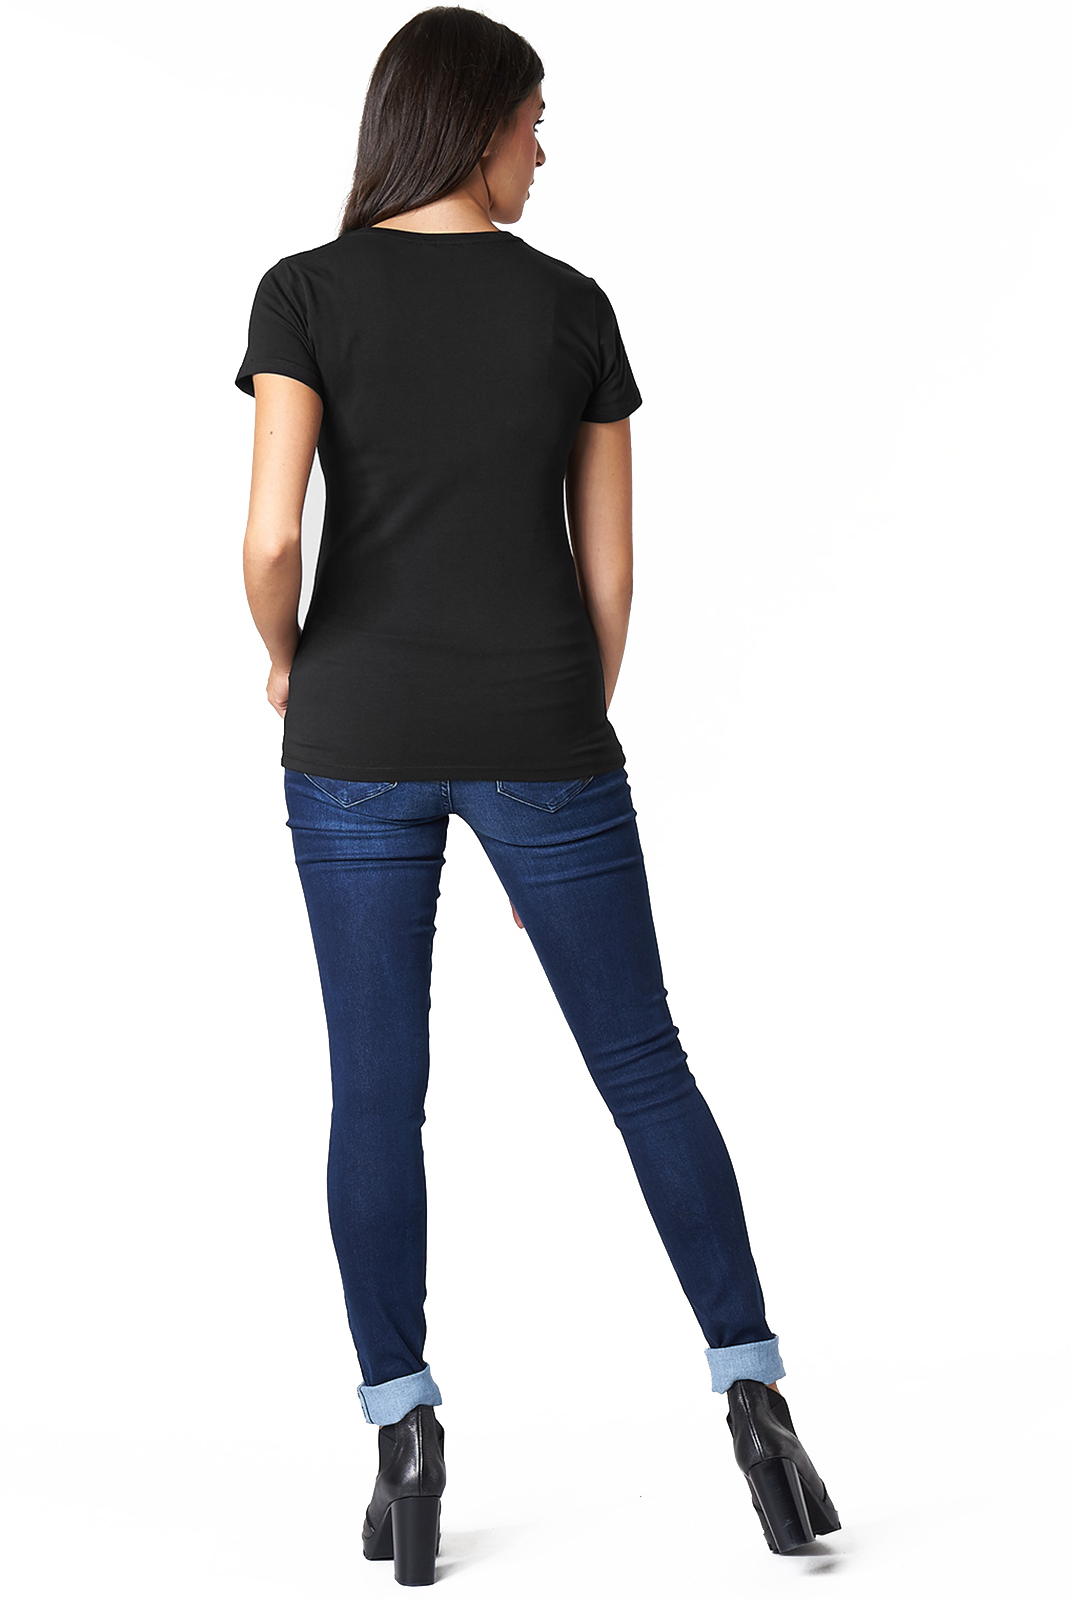 Tee shirt  Kaporal XILL BLACK